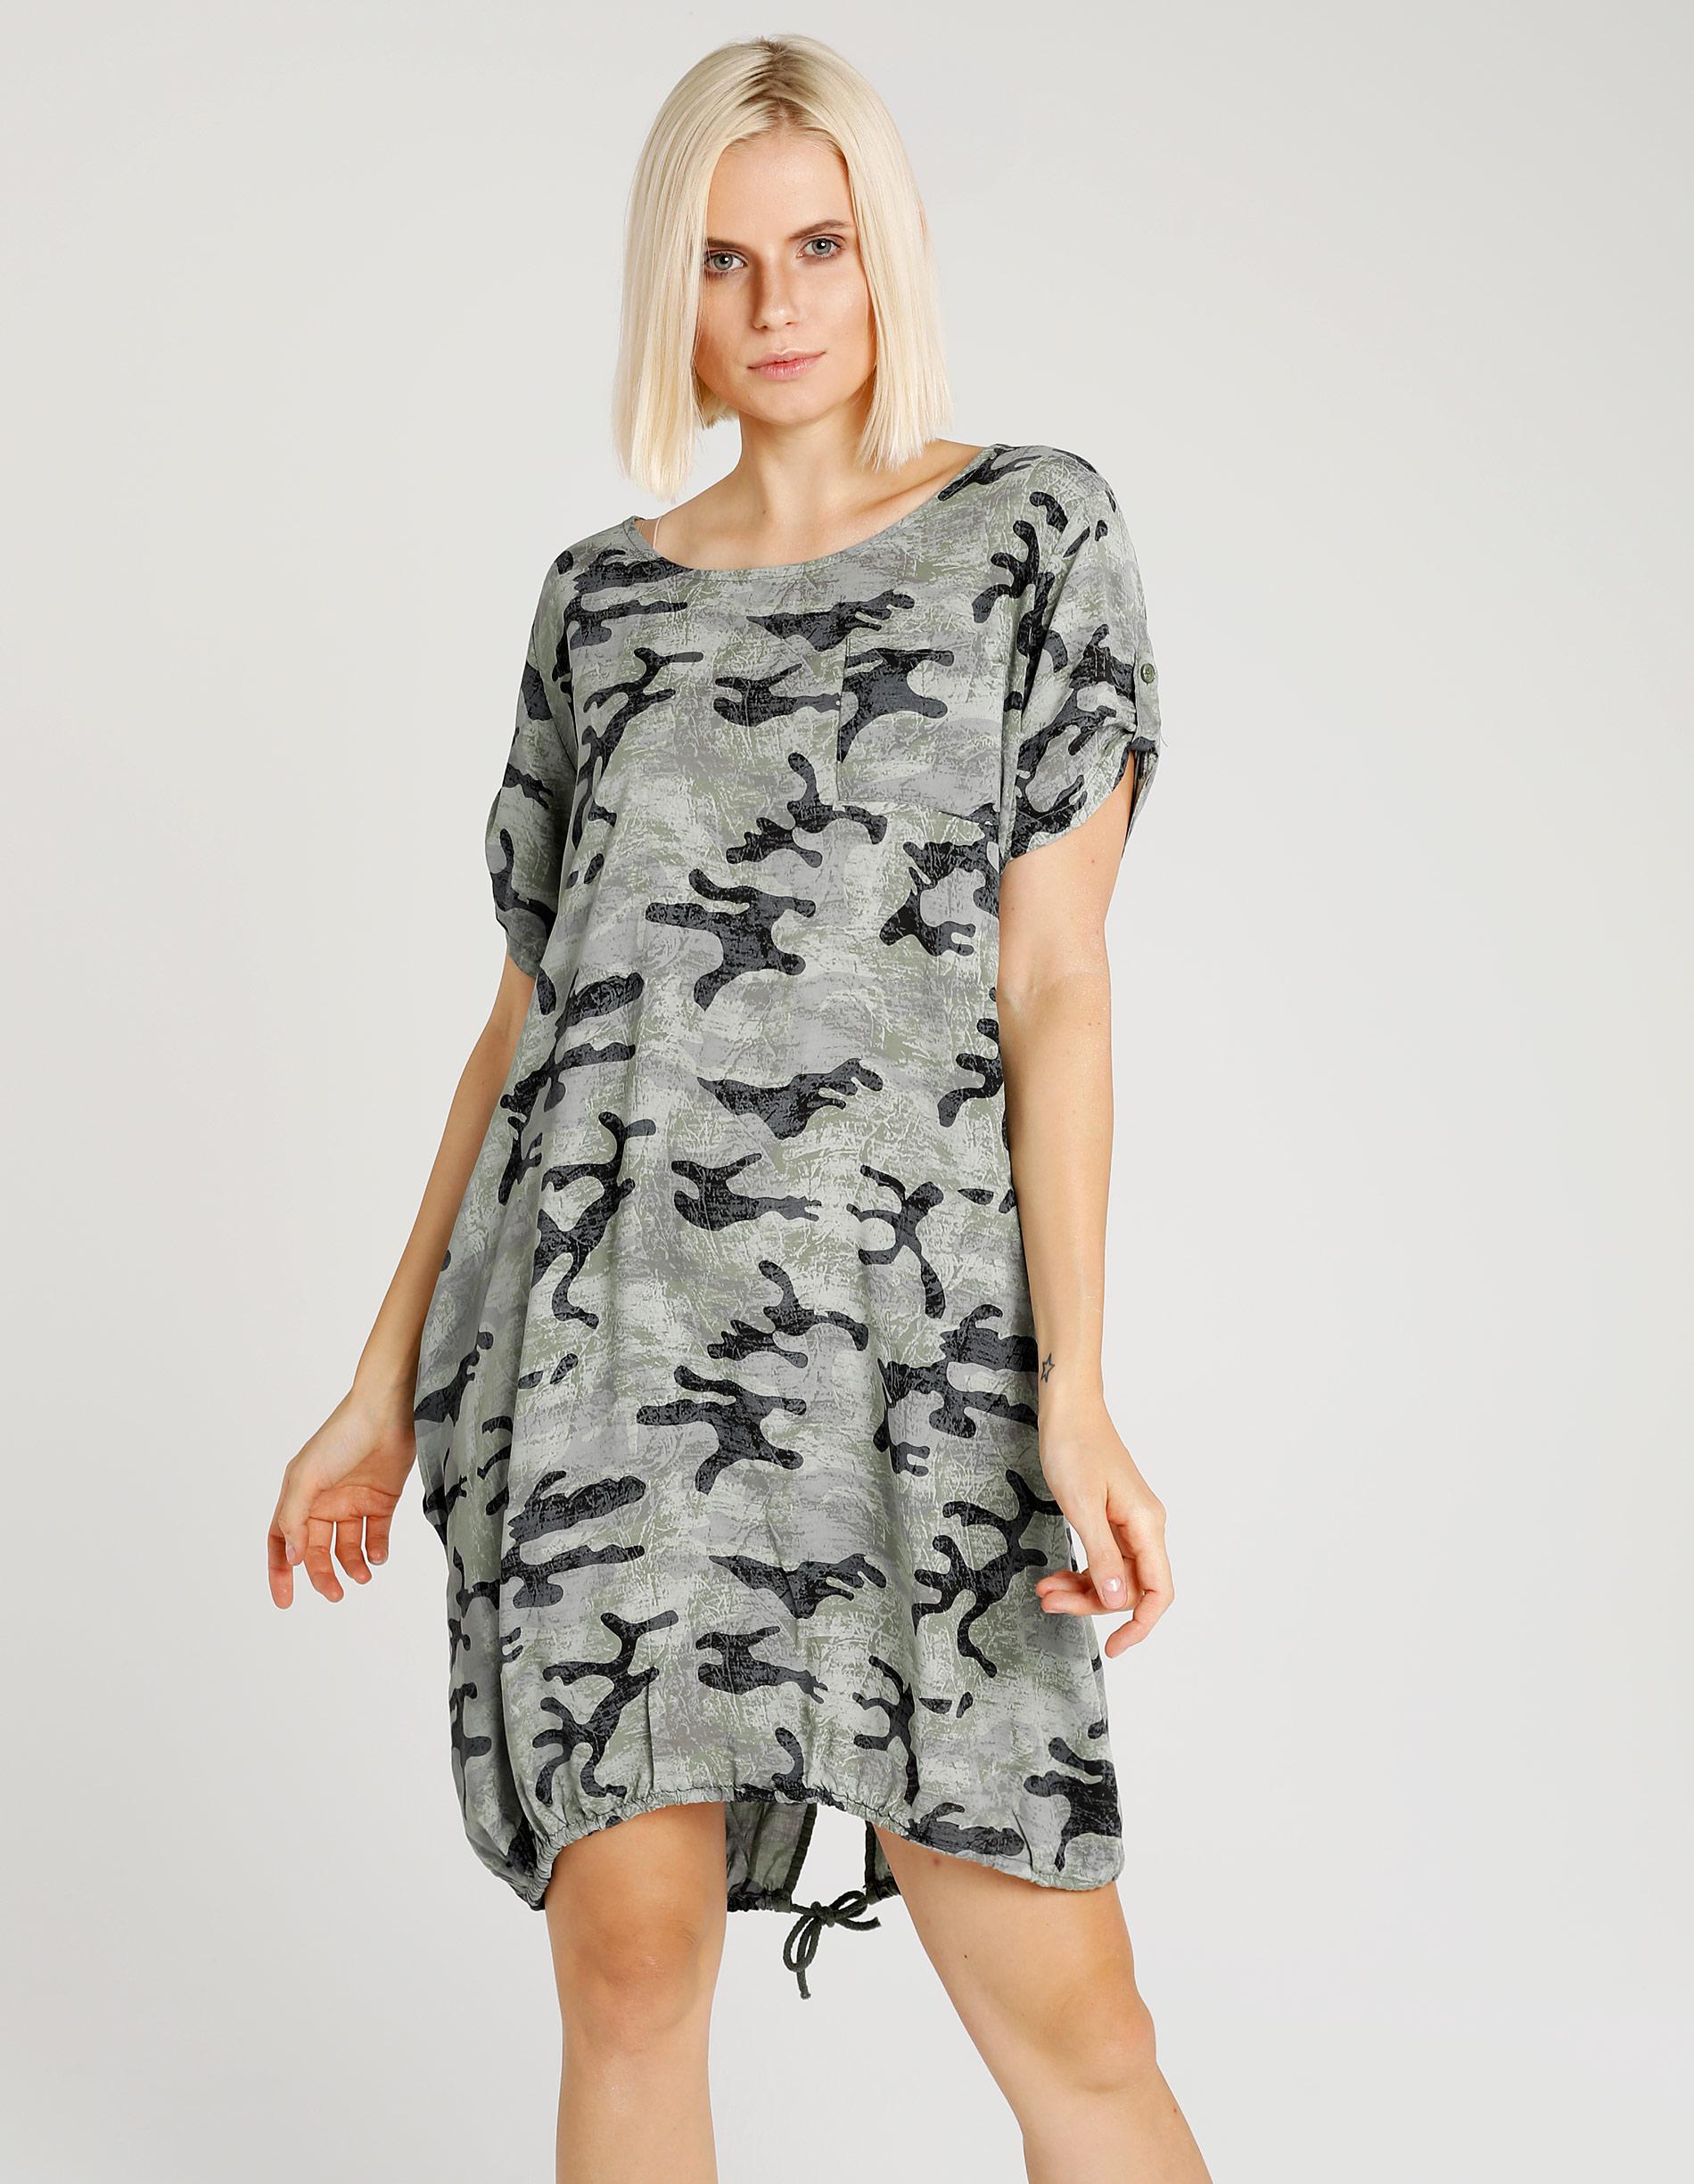 Sukienka - 36-8896 MILIT - Unisono